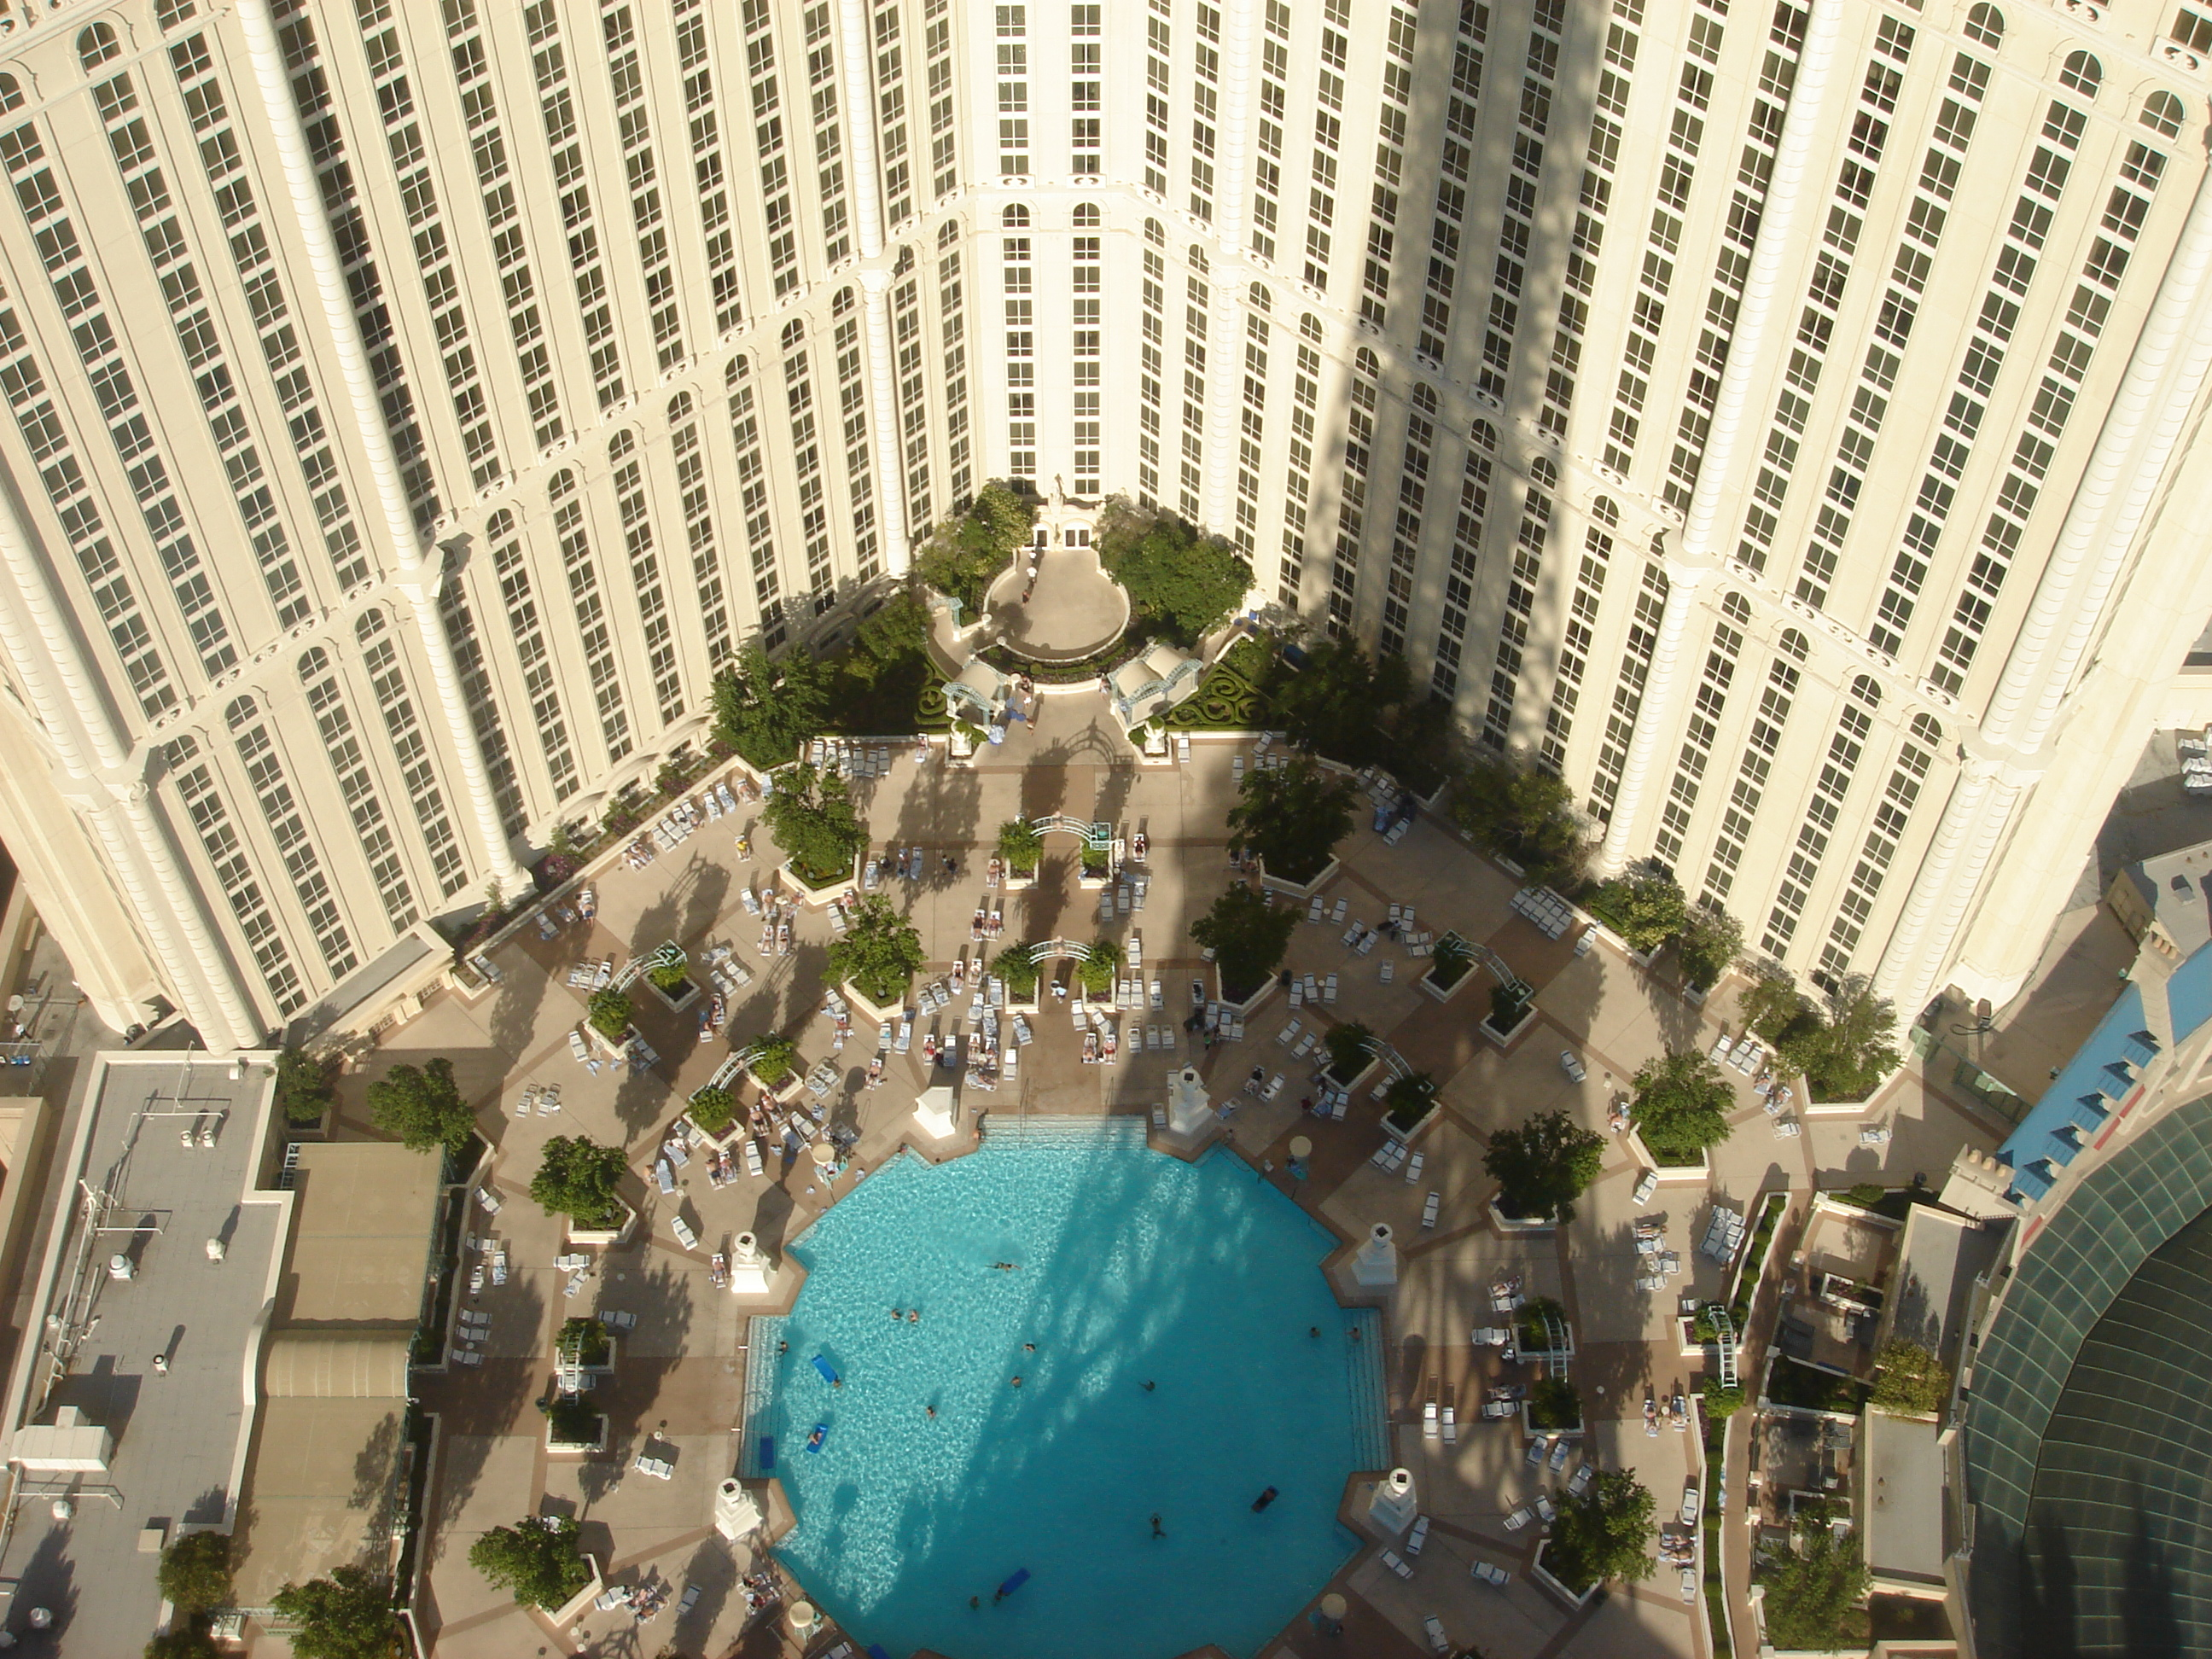 Paris hotel address las vegas / Loews stonybrook